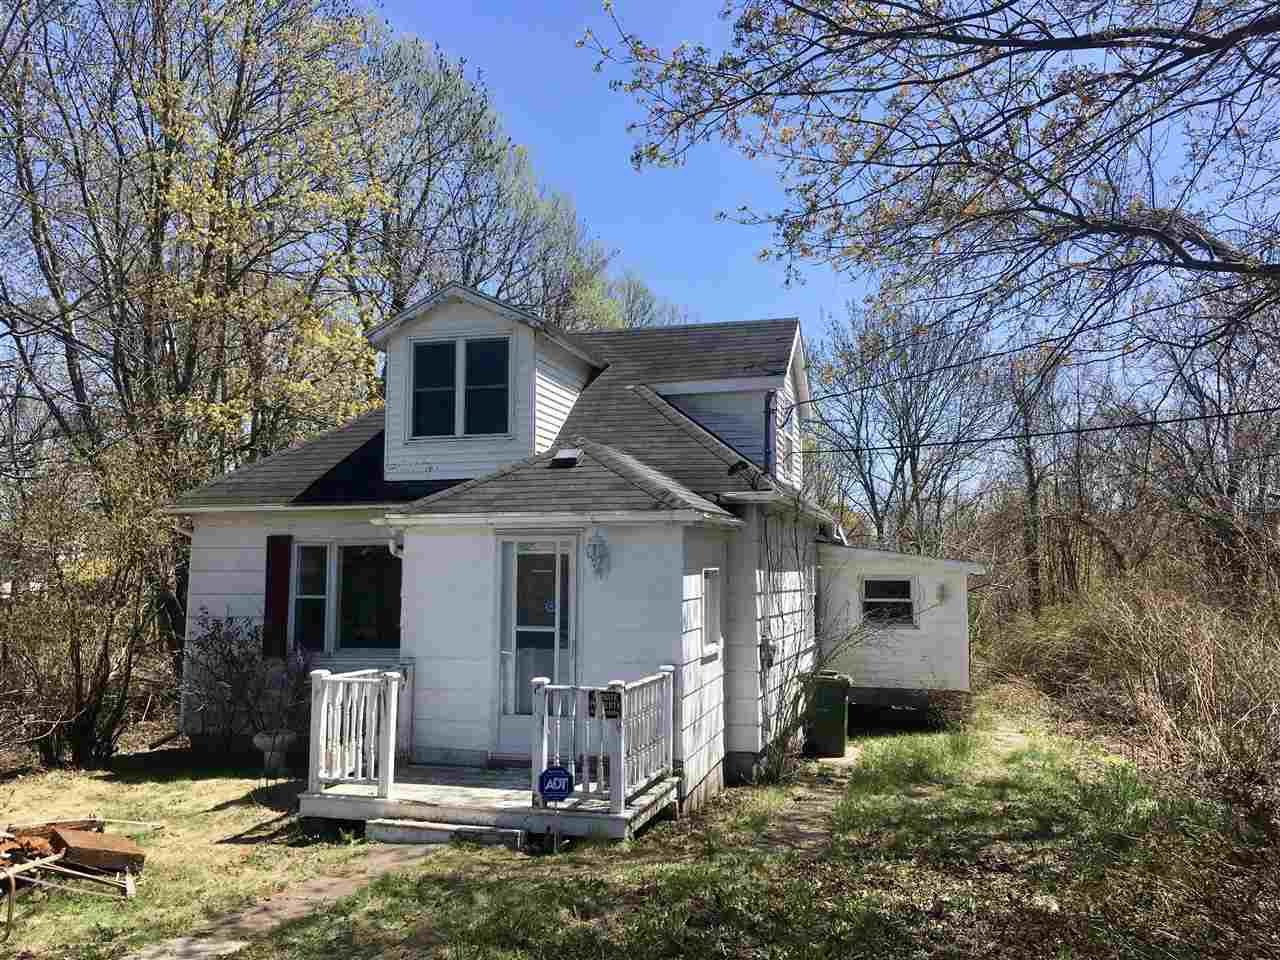 Main Photo: 15 Bark Street in Pictou: 107-Trenton,Westville,Pictou Residential for sale (Northern Region)  : MLS®# 201912479